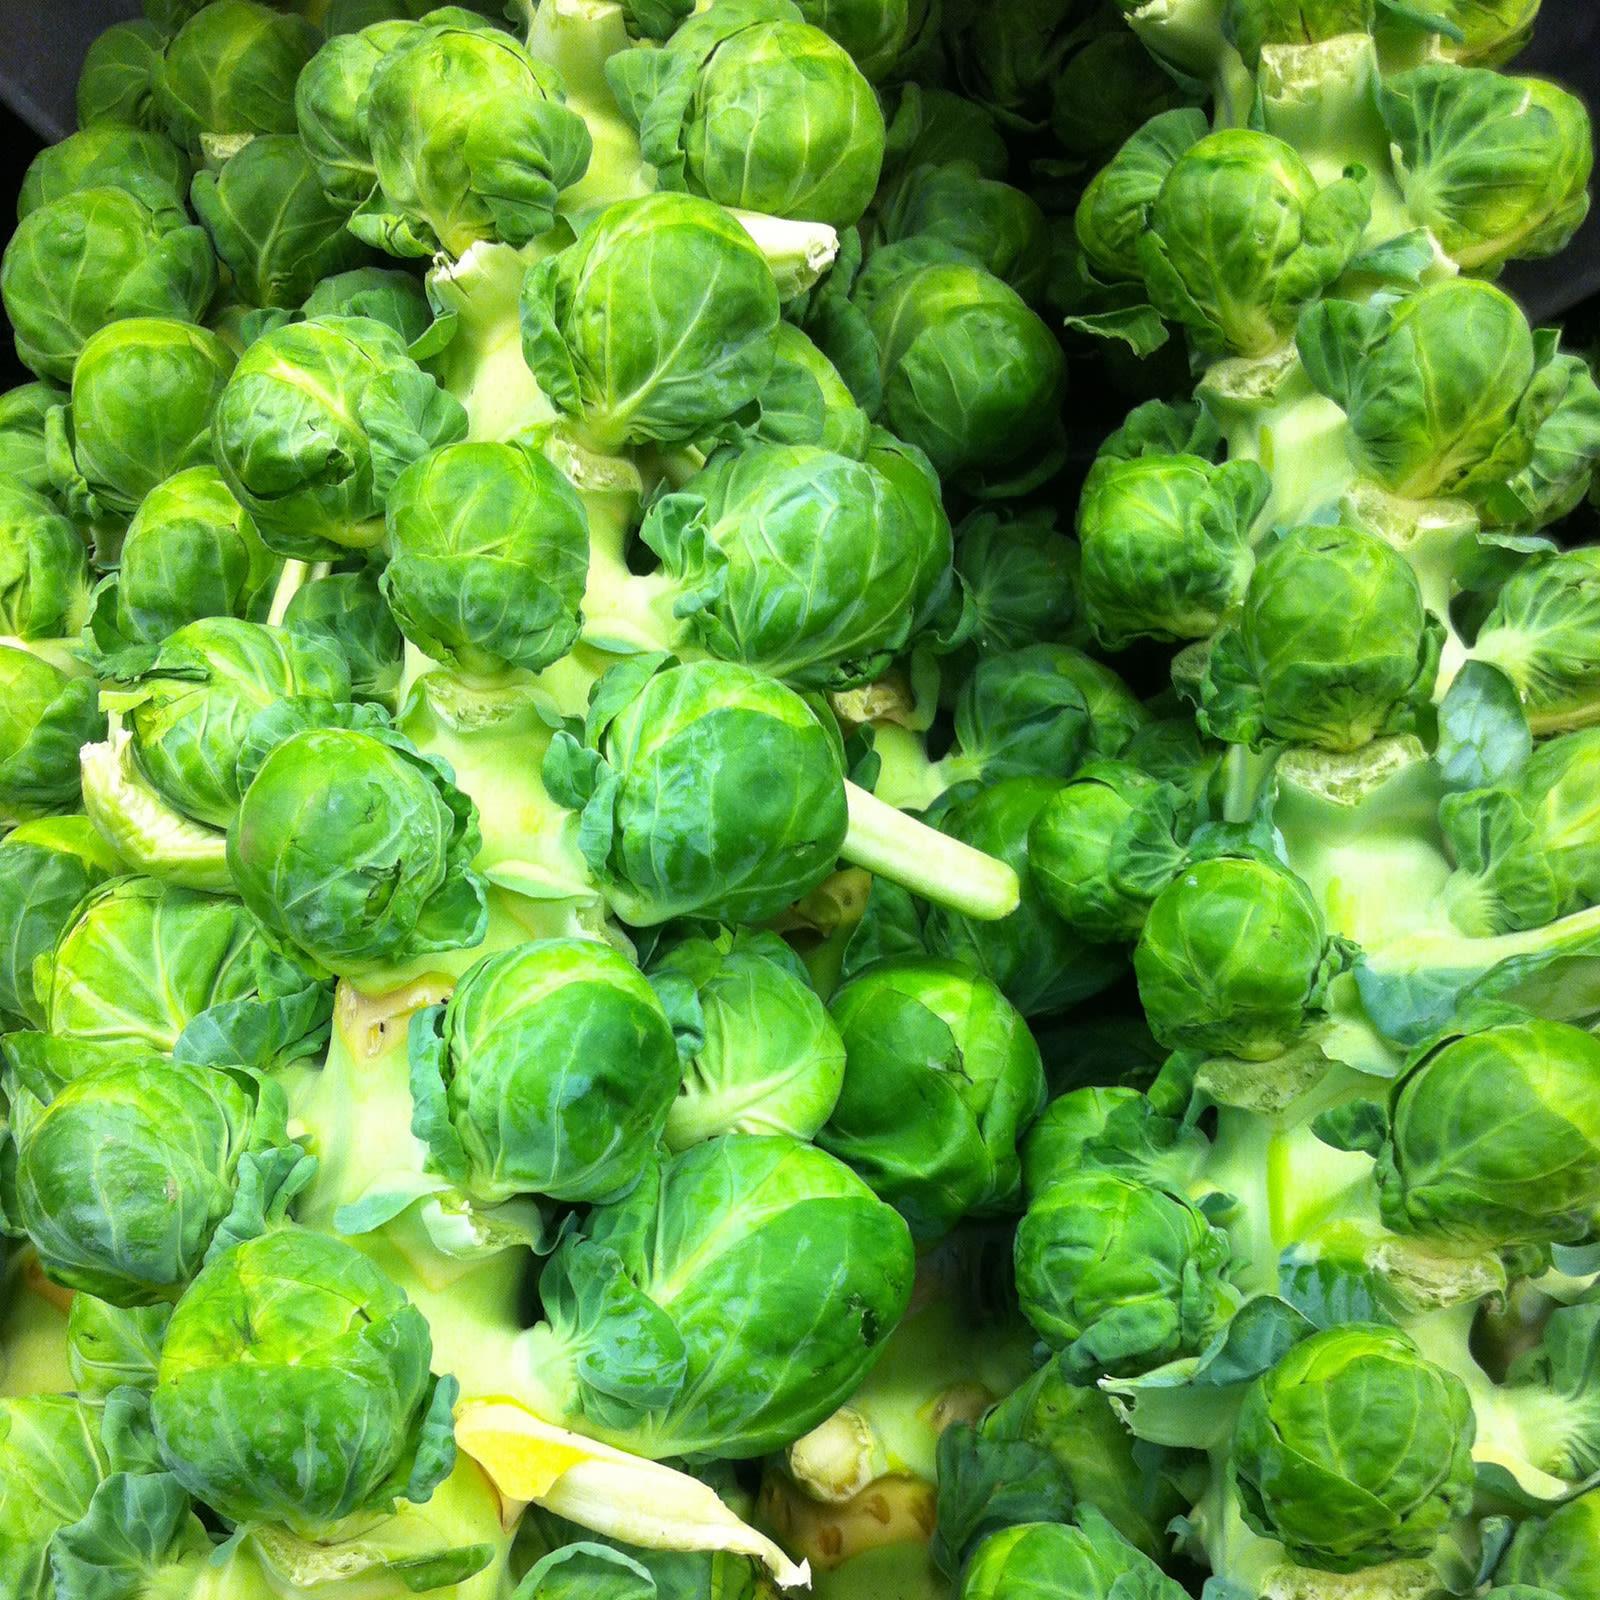 Brussels sprouts l8nvsw